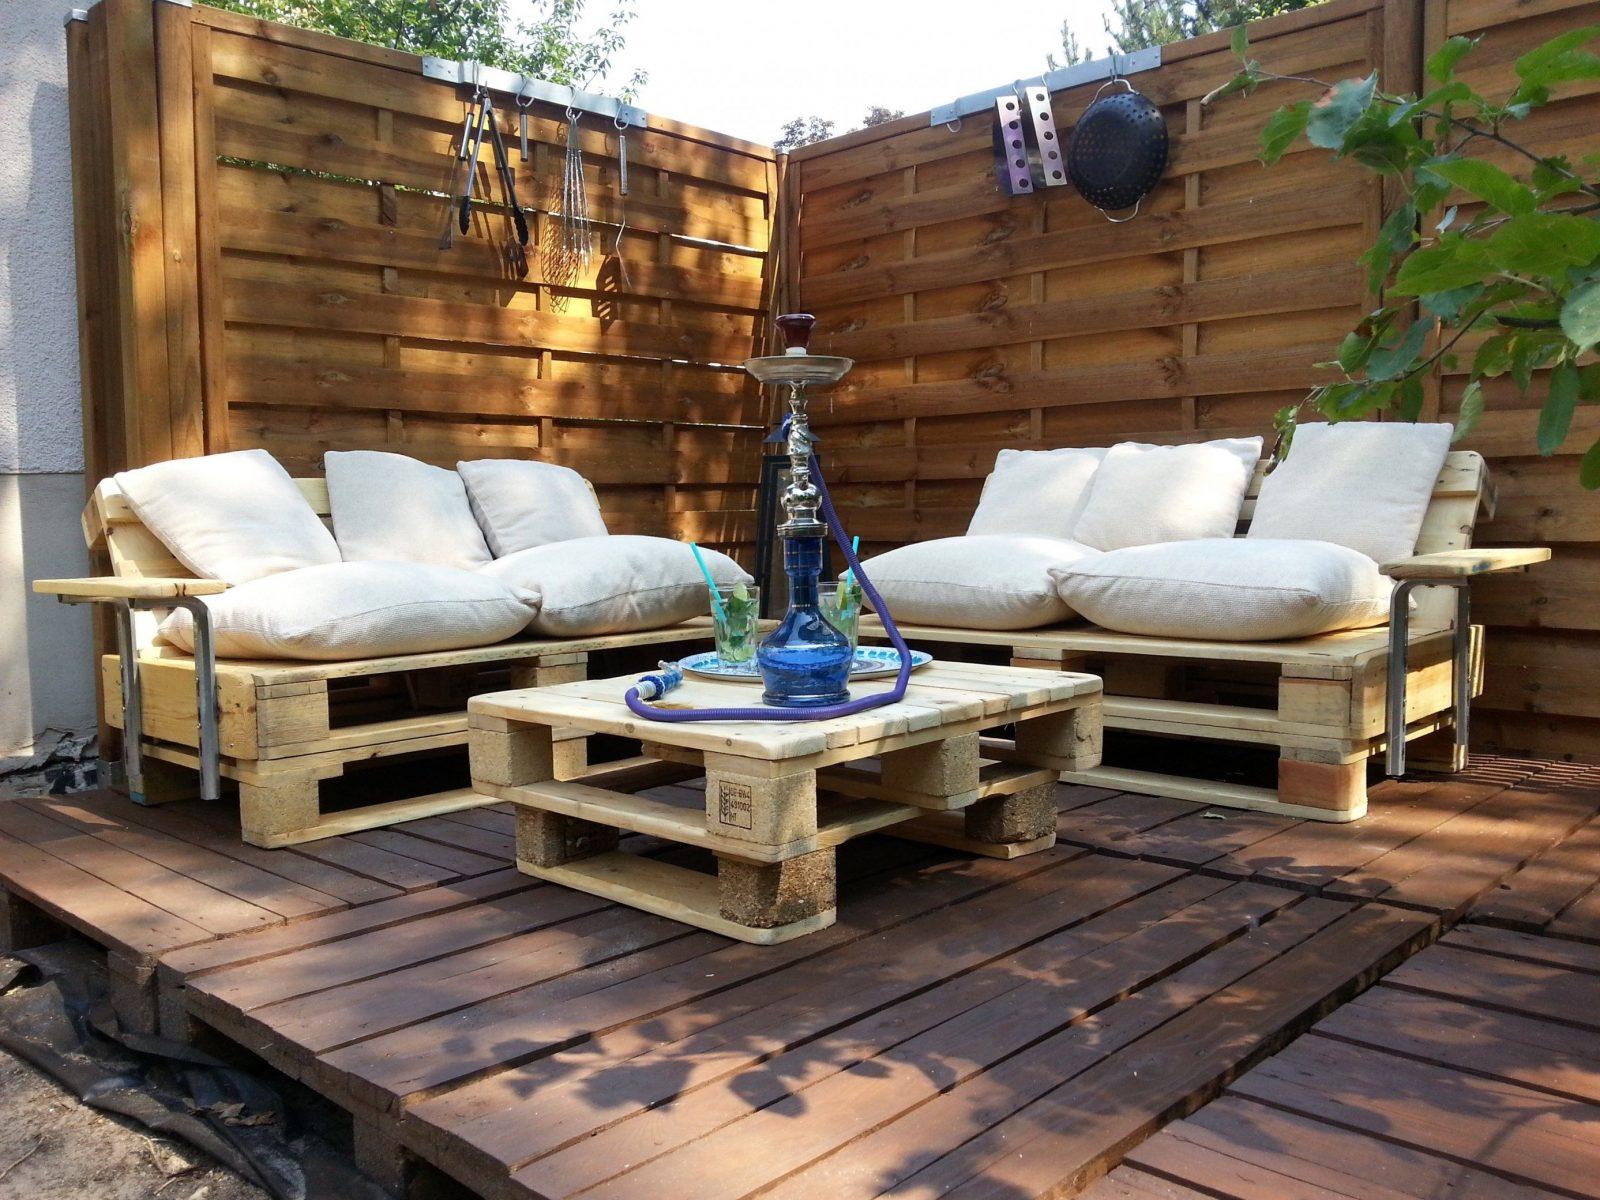 Elegantes Lounge Möbel Selber Bauen Lounge Ecke Garten Selber Bauen von Loungemöbel Garten Selber Bauen Photo